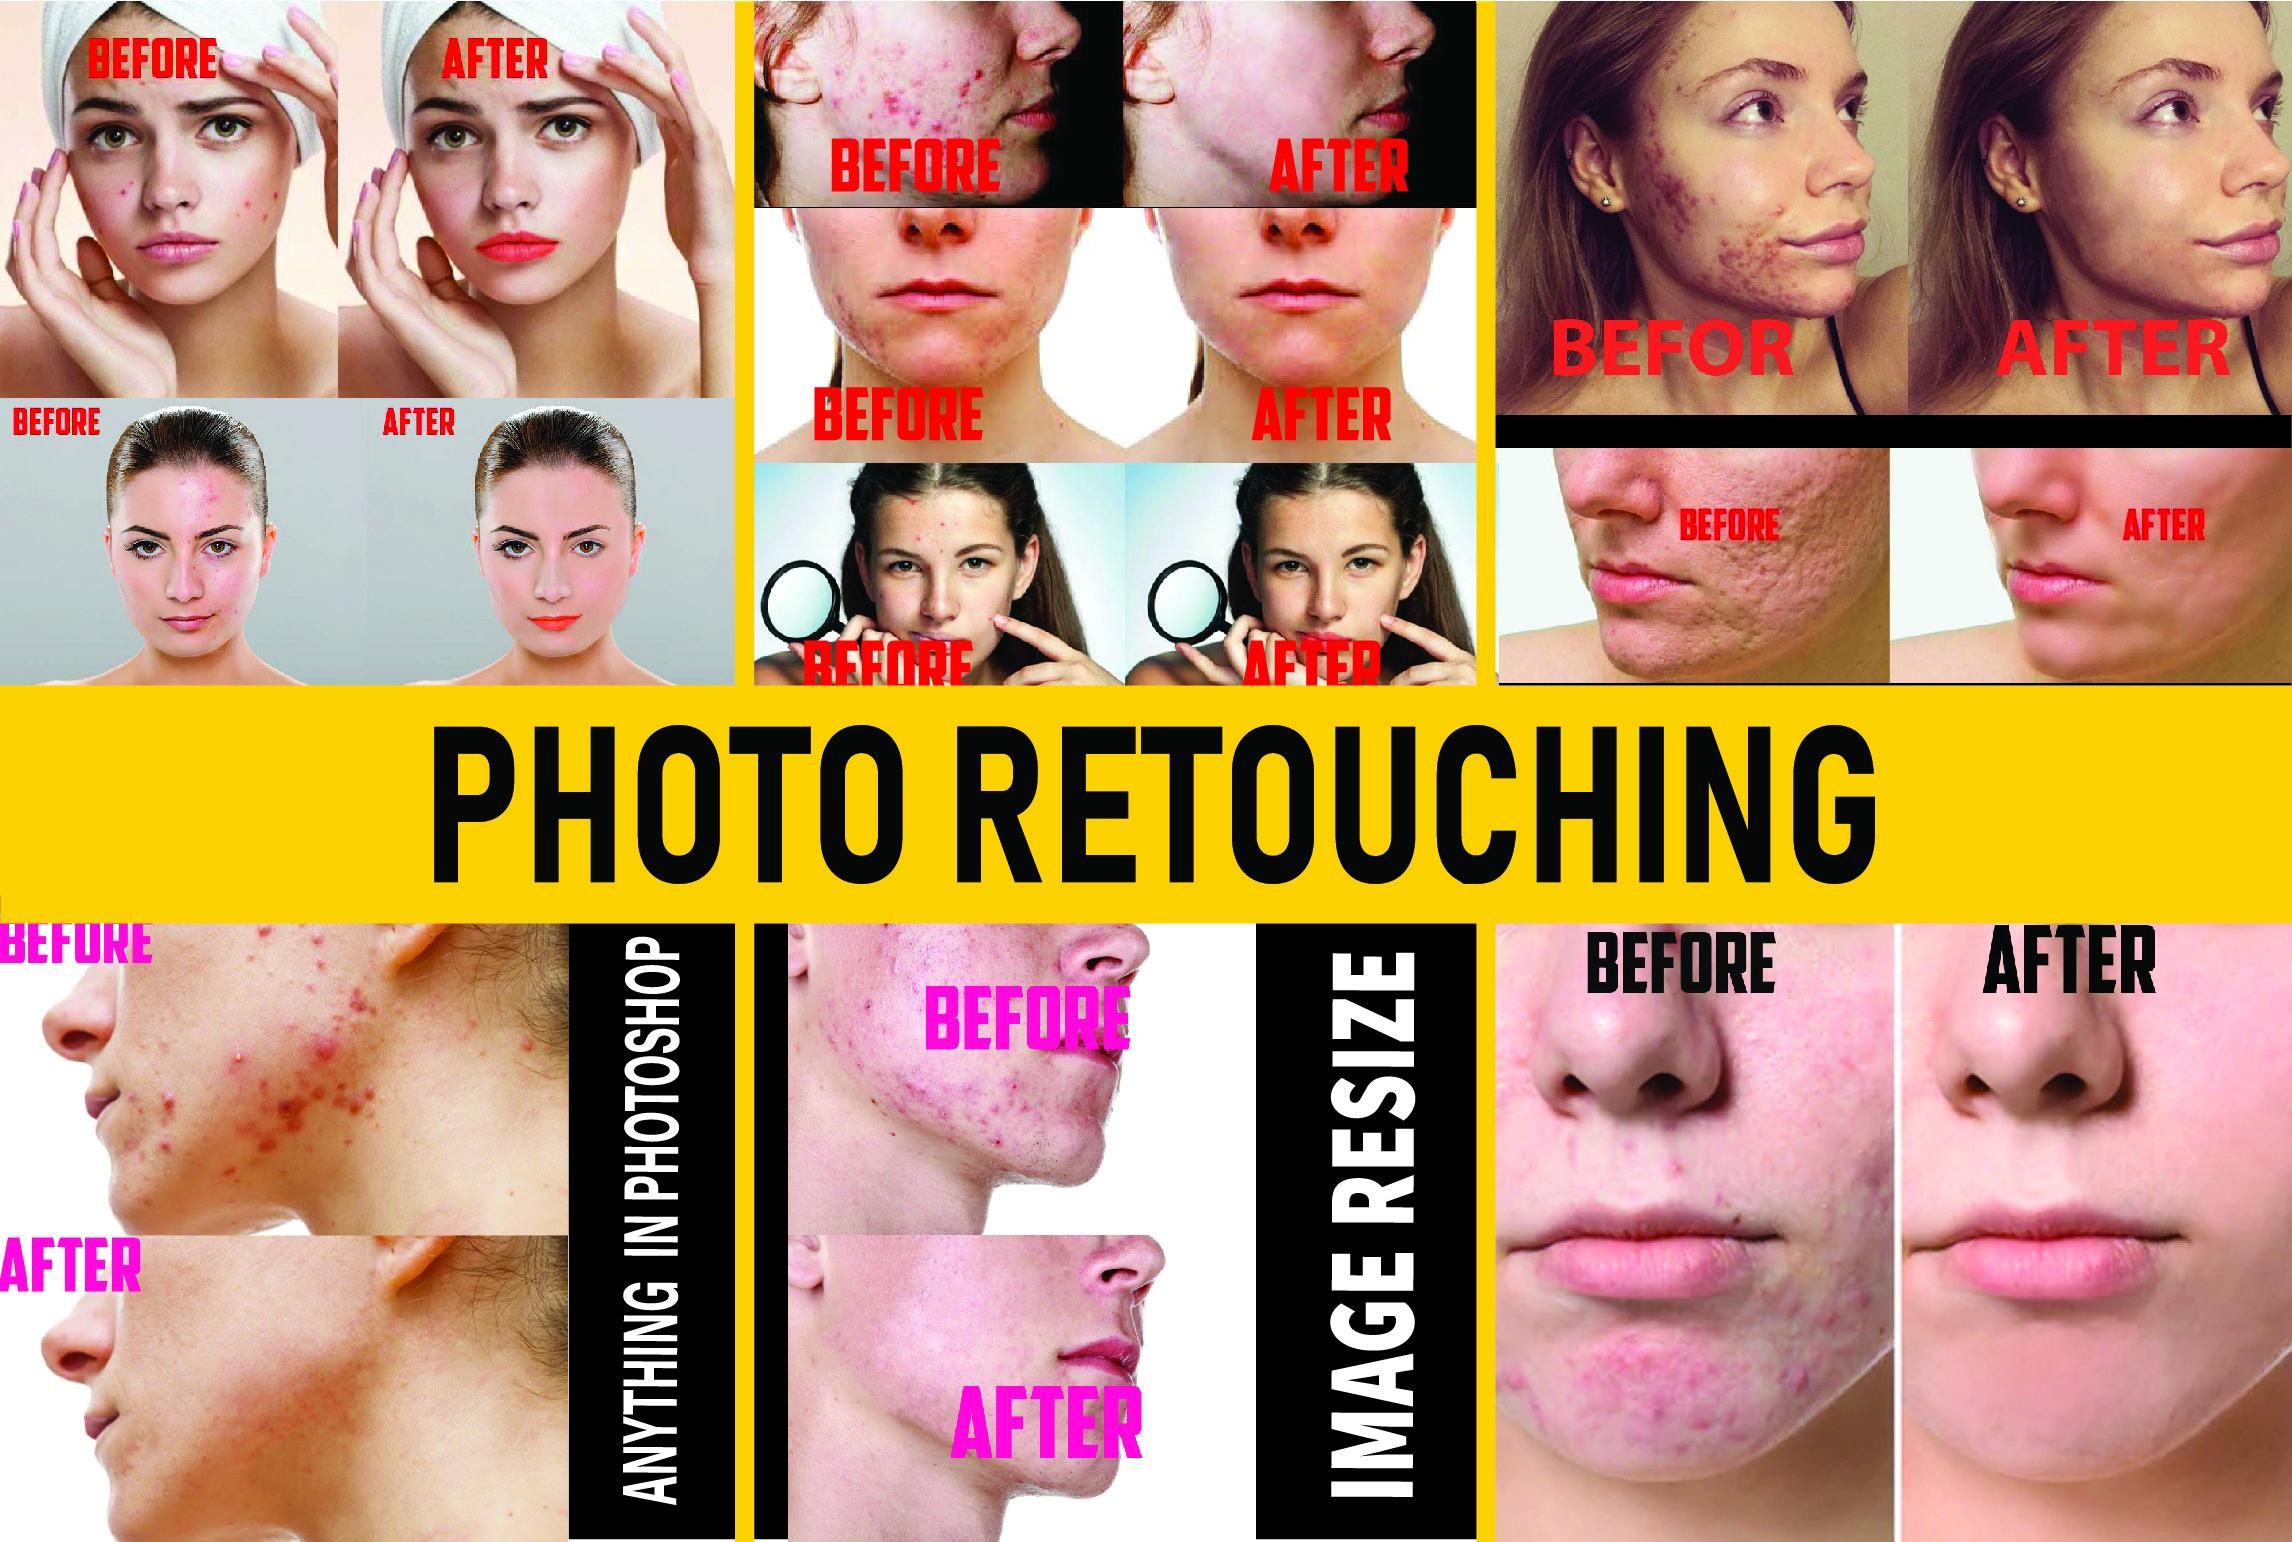 I will photoshop editing photo retouching fast